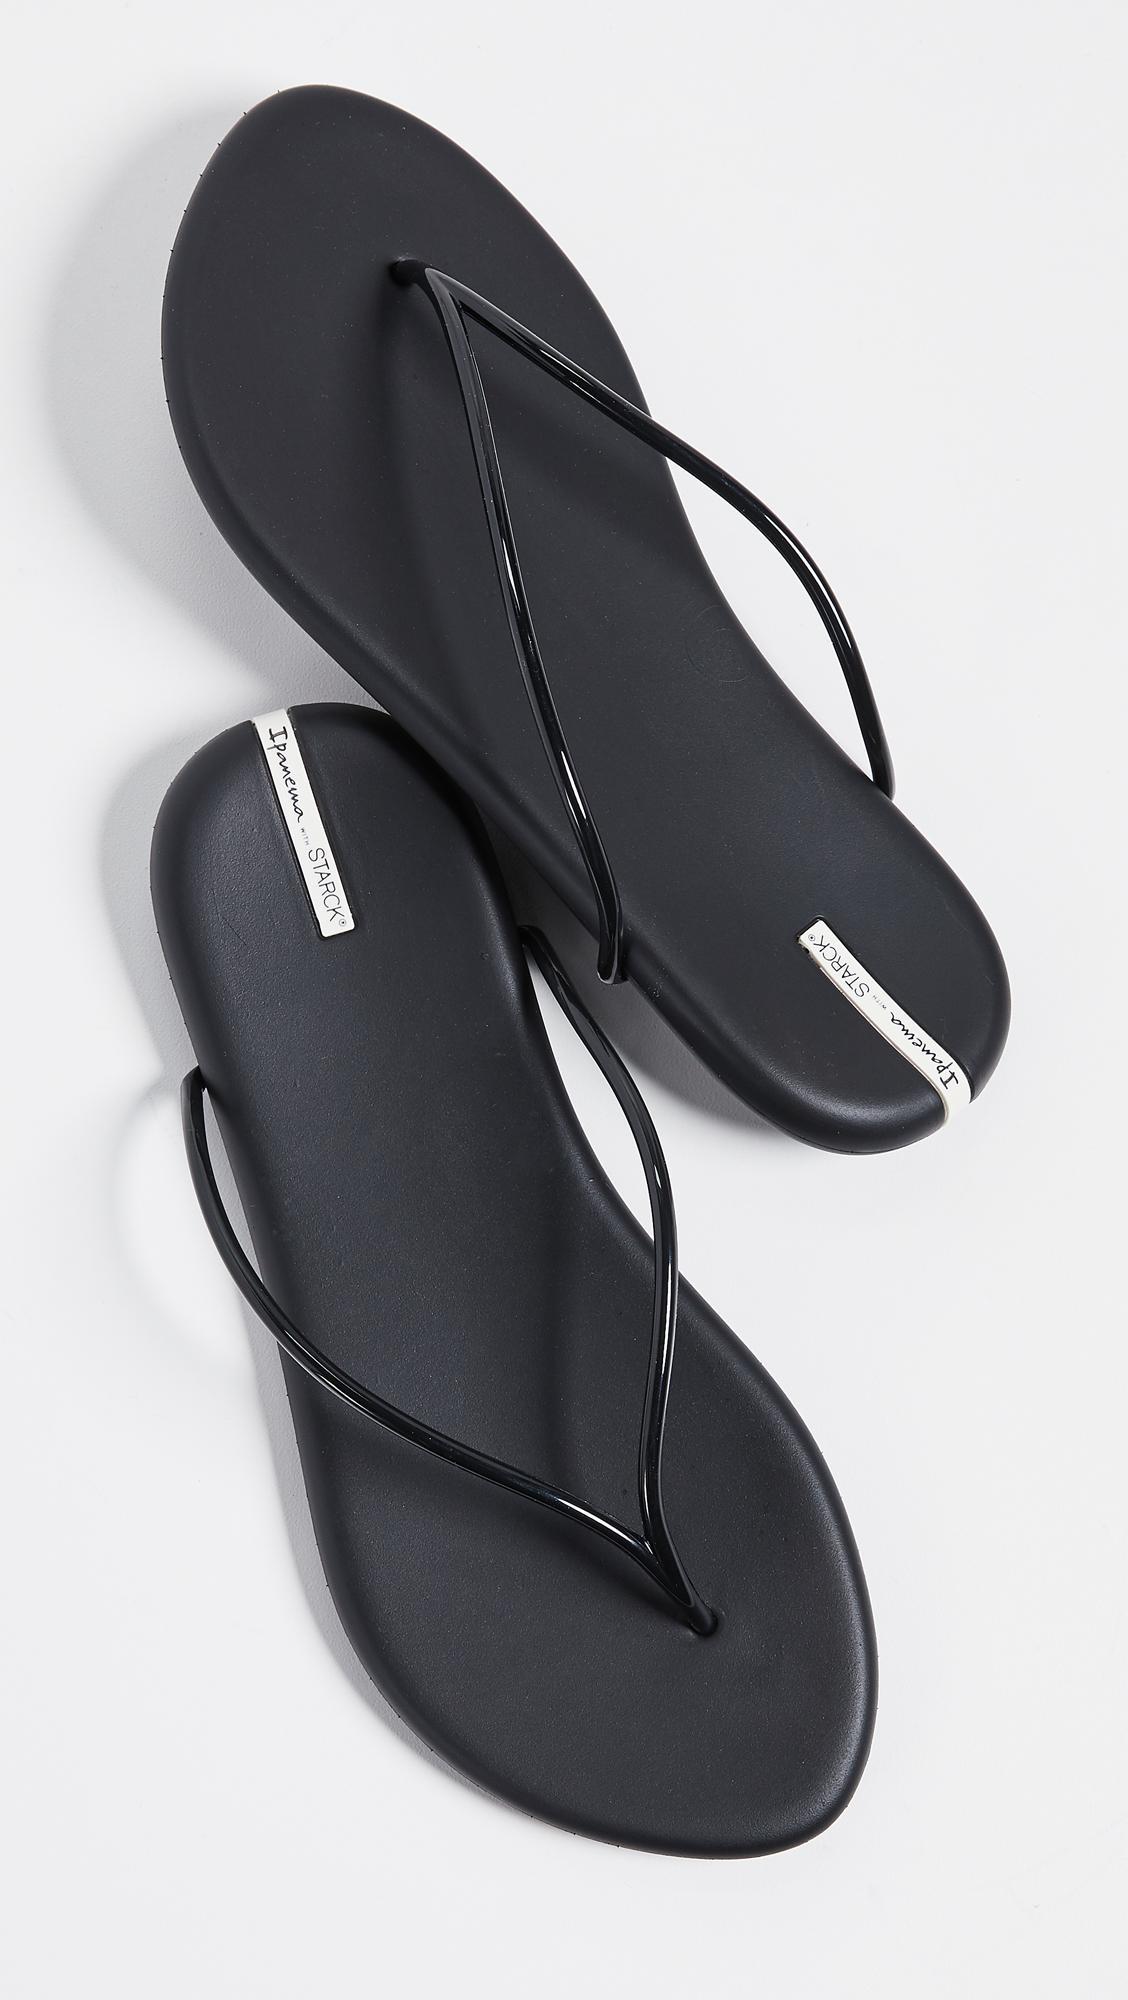 85a0896d20ce Ipanema Philippe Starck Thing M Ii Flip Flops in Black - Lyst